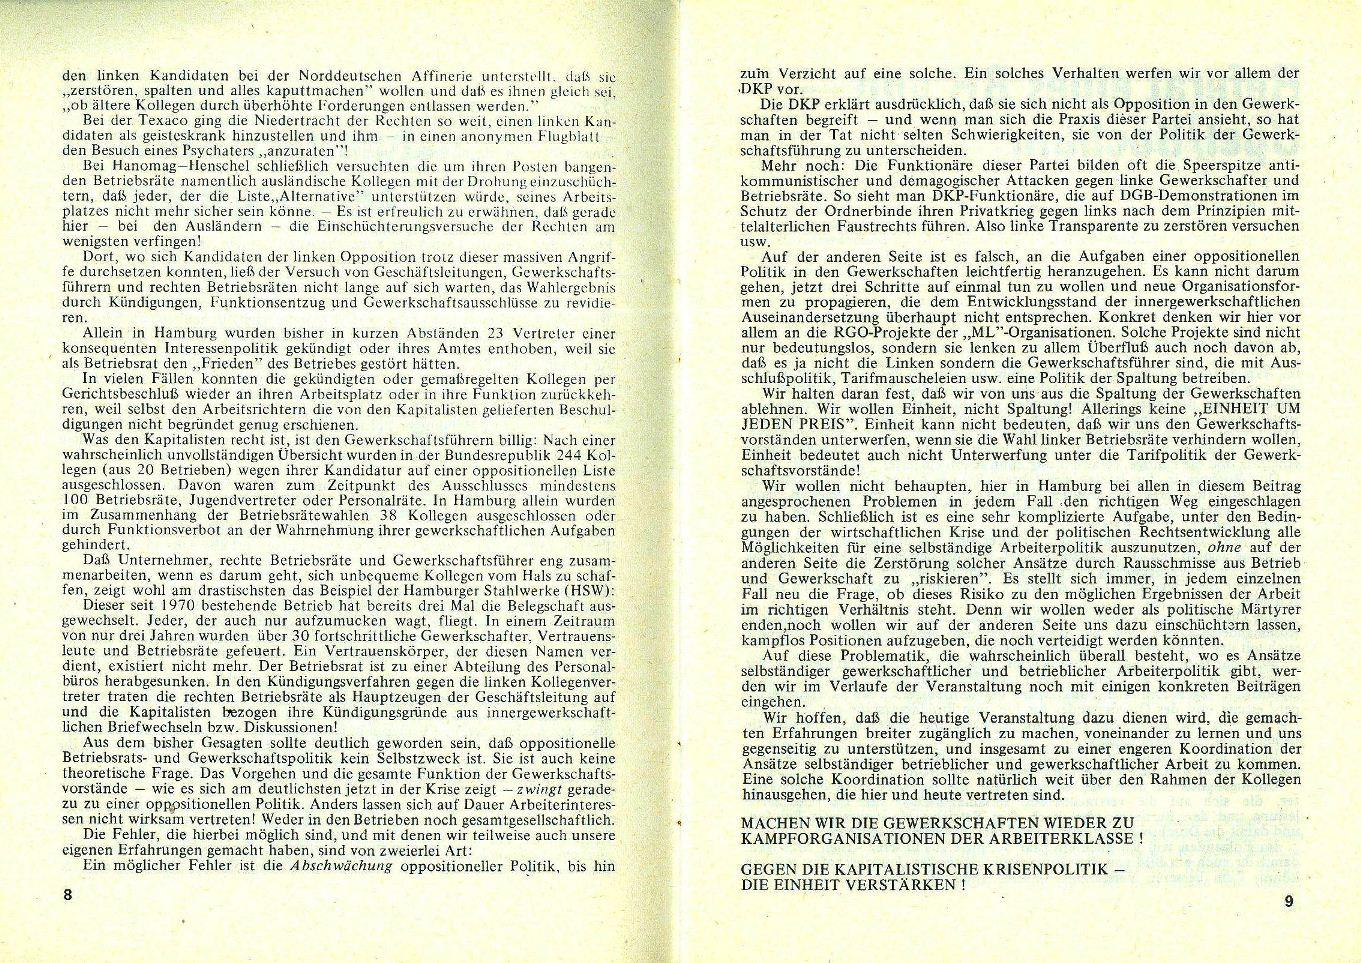 Betriebsraeteveranstaltung_1975_005